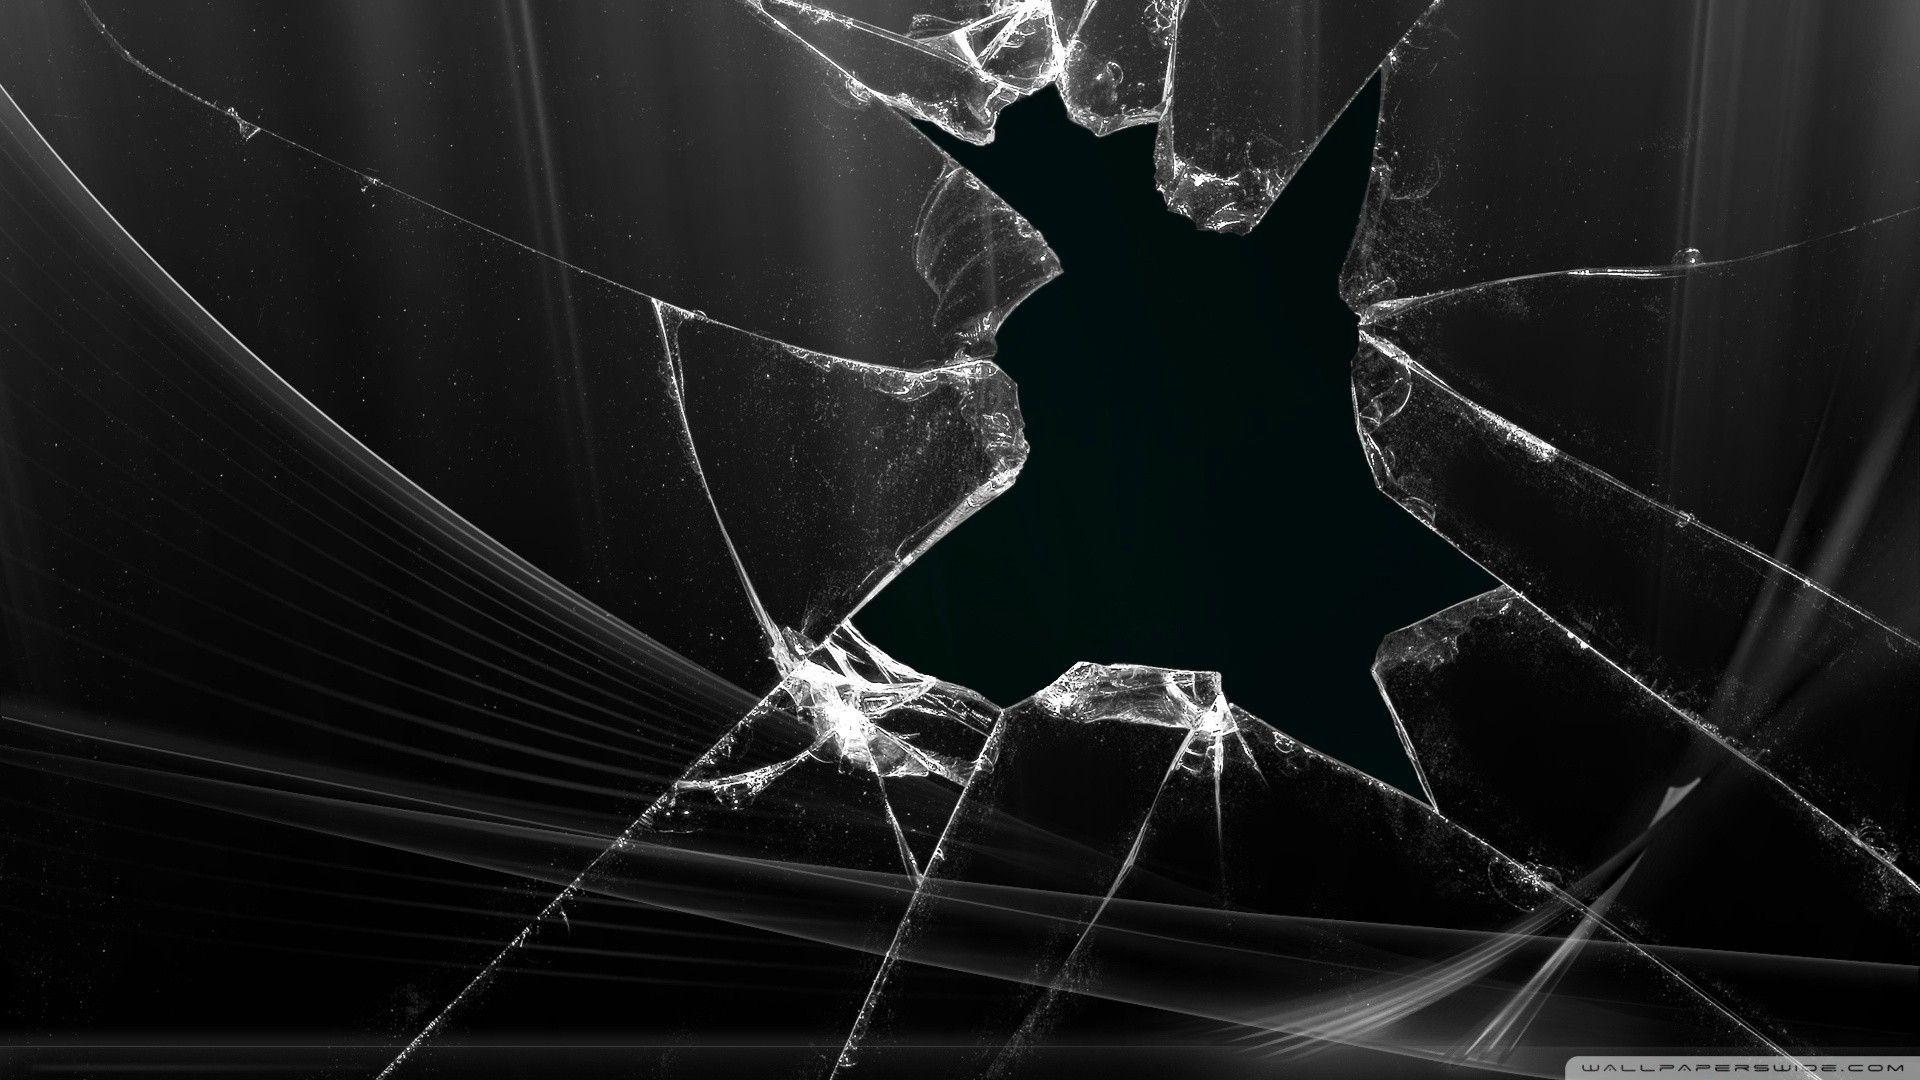 Backgrounds Broken Screen Wallpaper Abstract Wallpaper Broken Glass Wallpaper